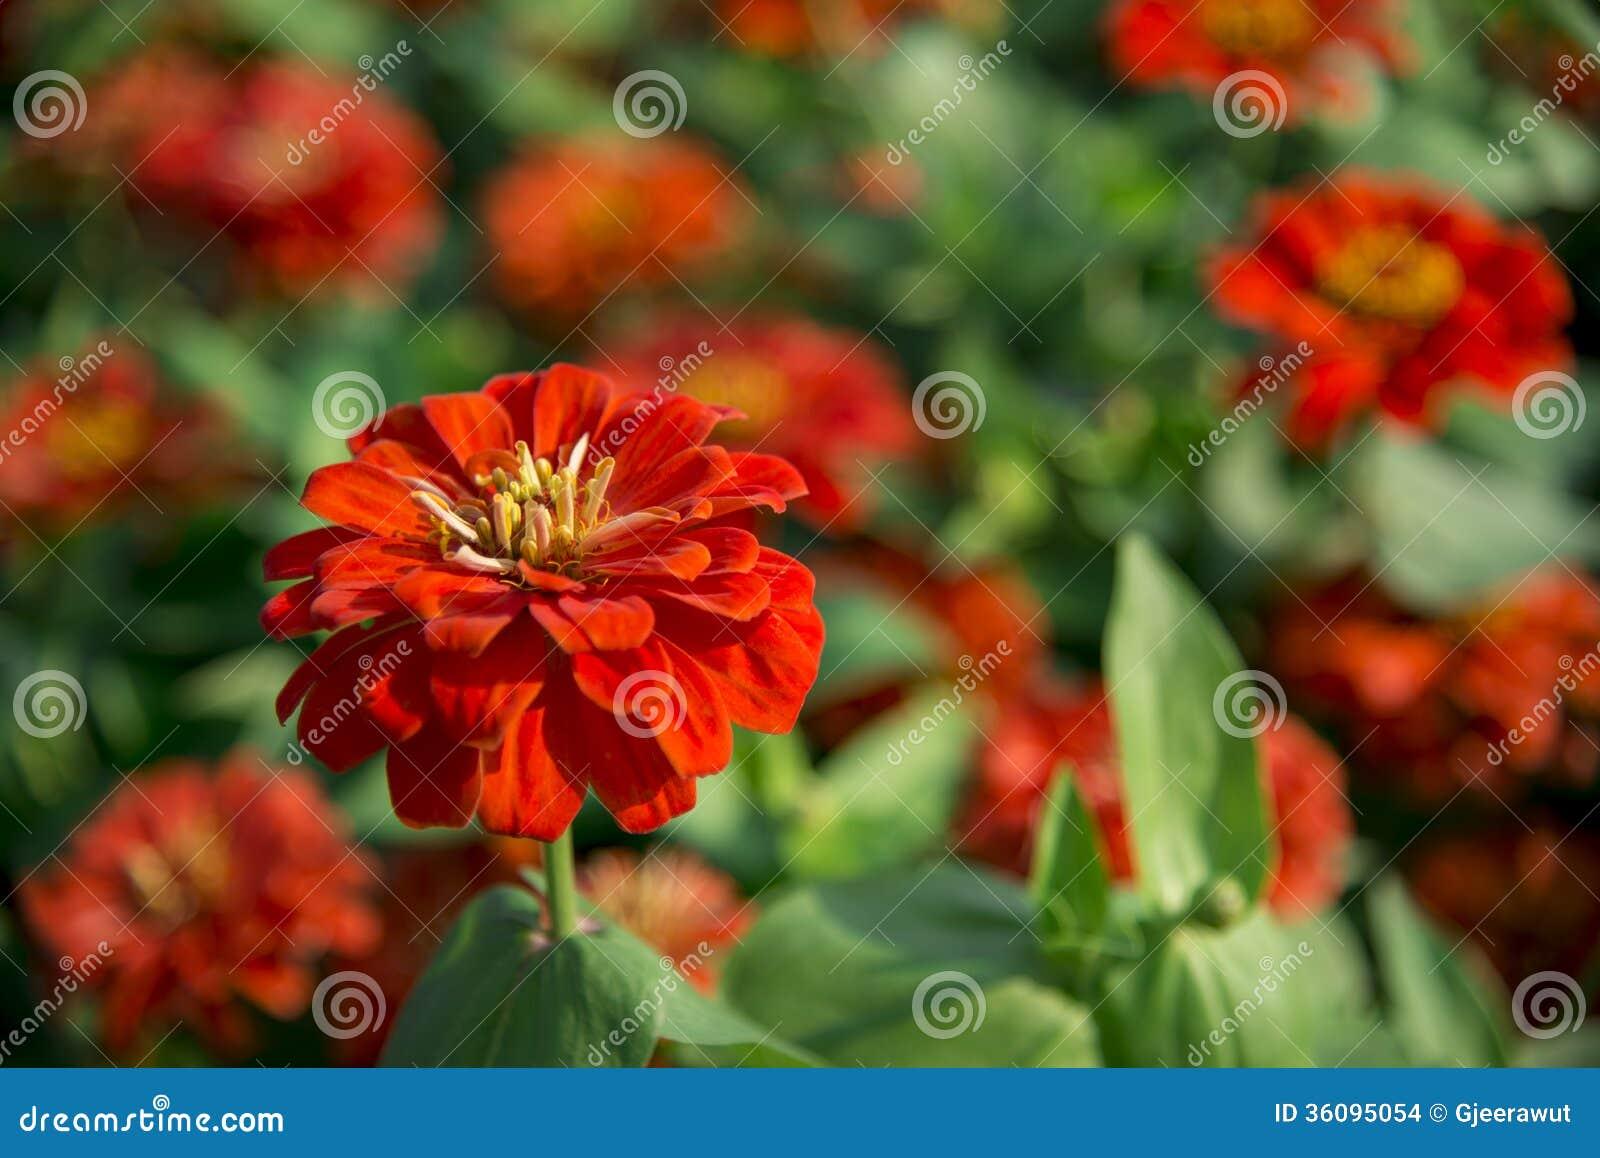 Fleurs oranges de gerbera dans le jardin images stock for Fleurs dans le jardin